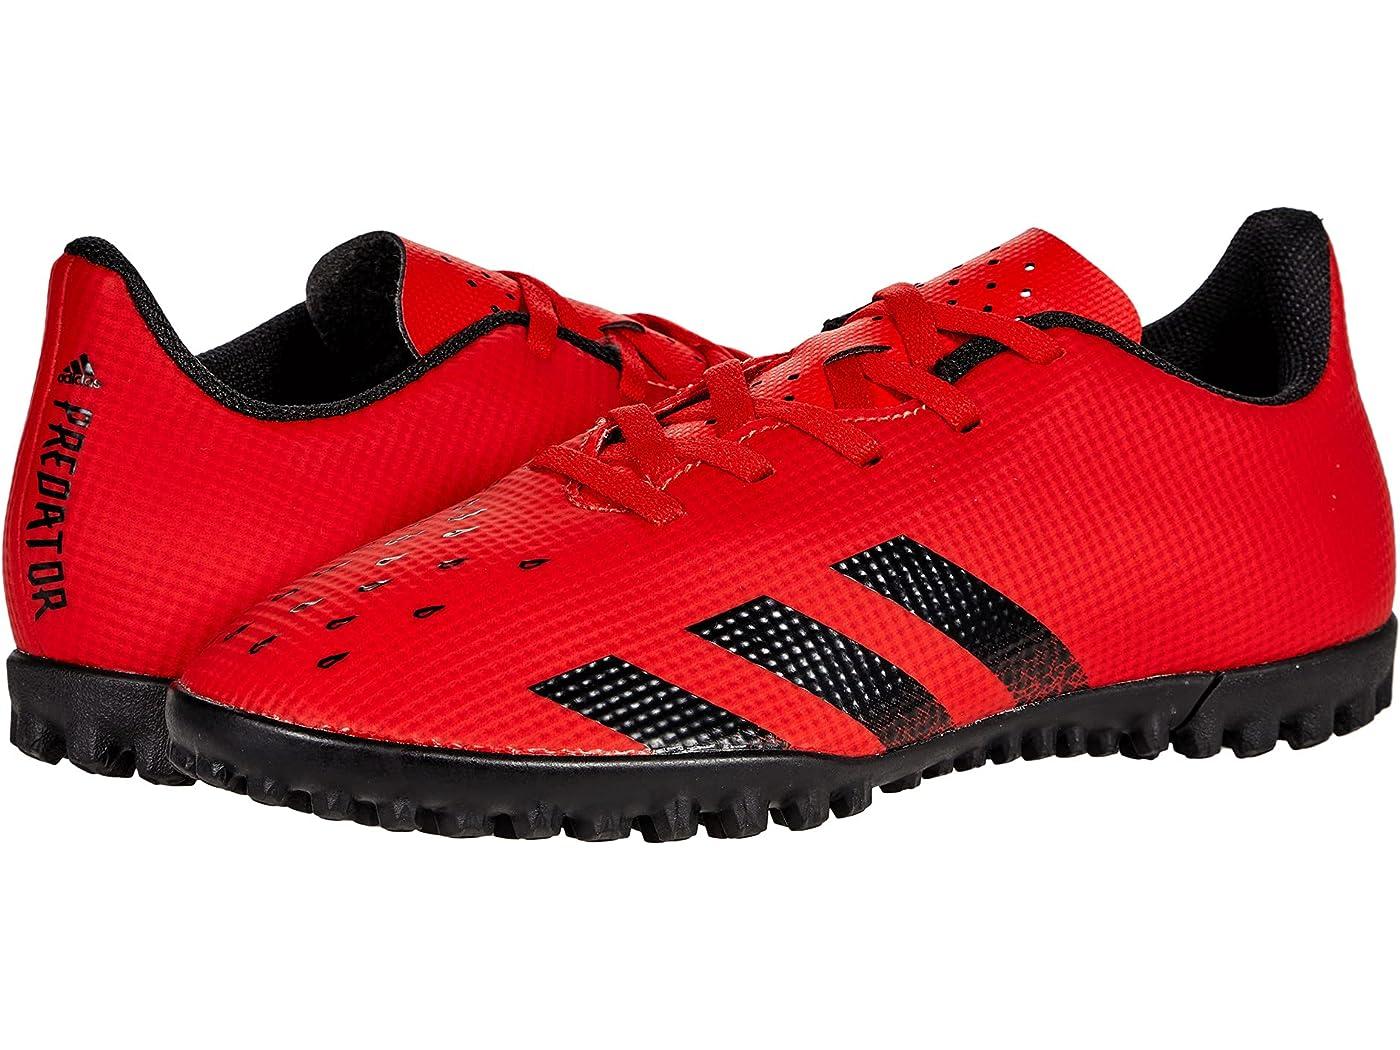 Adidas Predator Freak 4 Turf Soccer Cleats